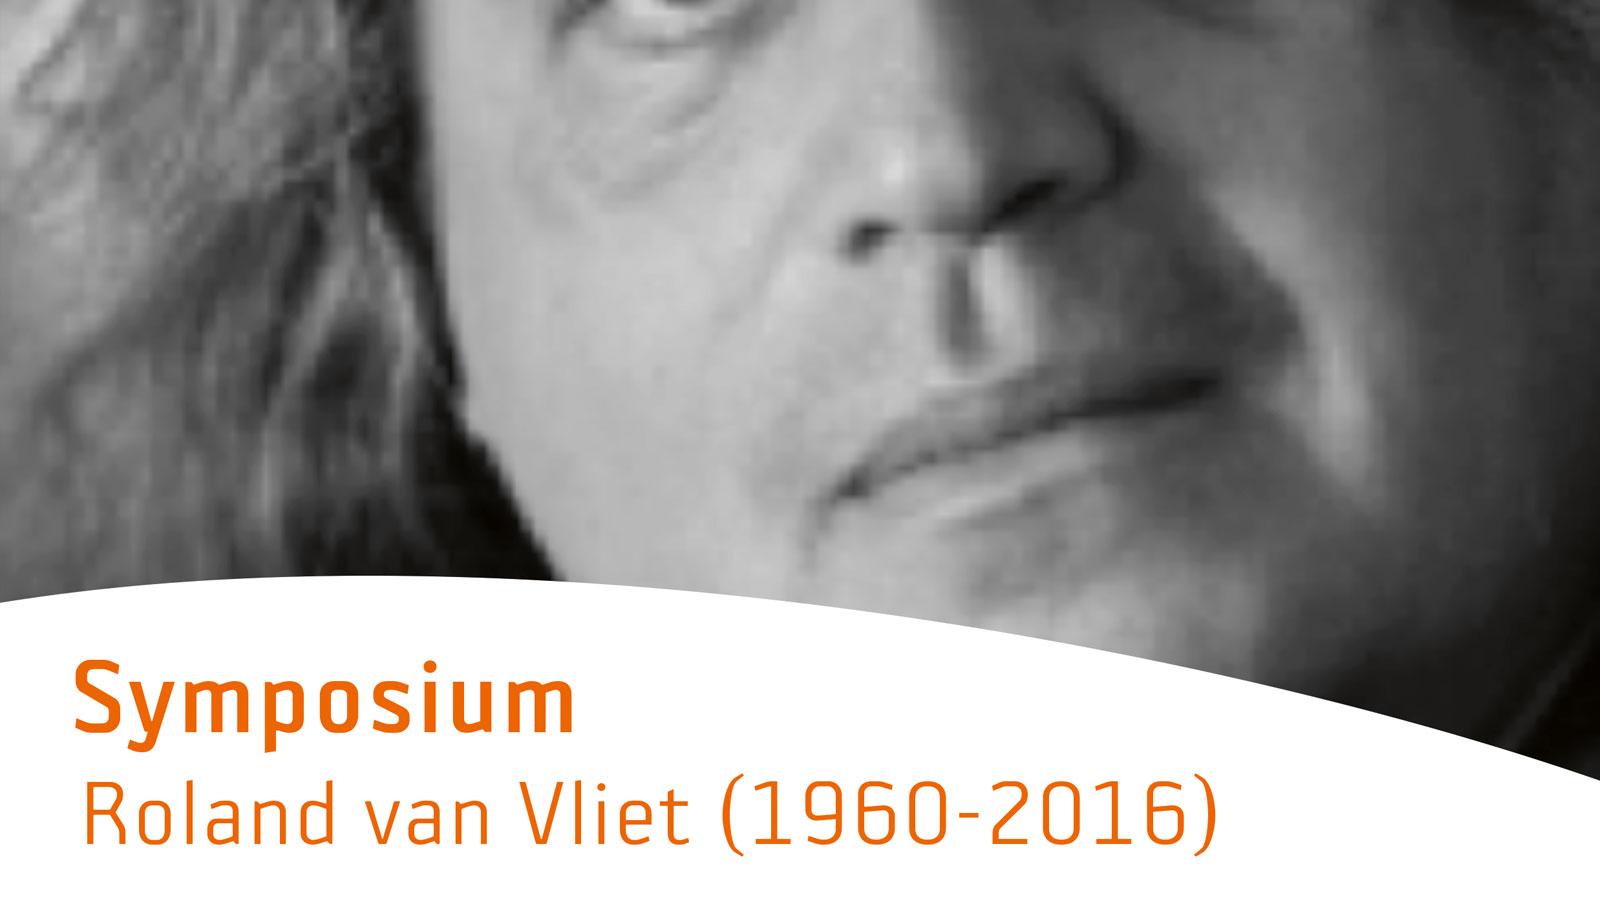 Symposium Roland van Vliet (1960-2016)